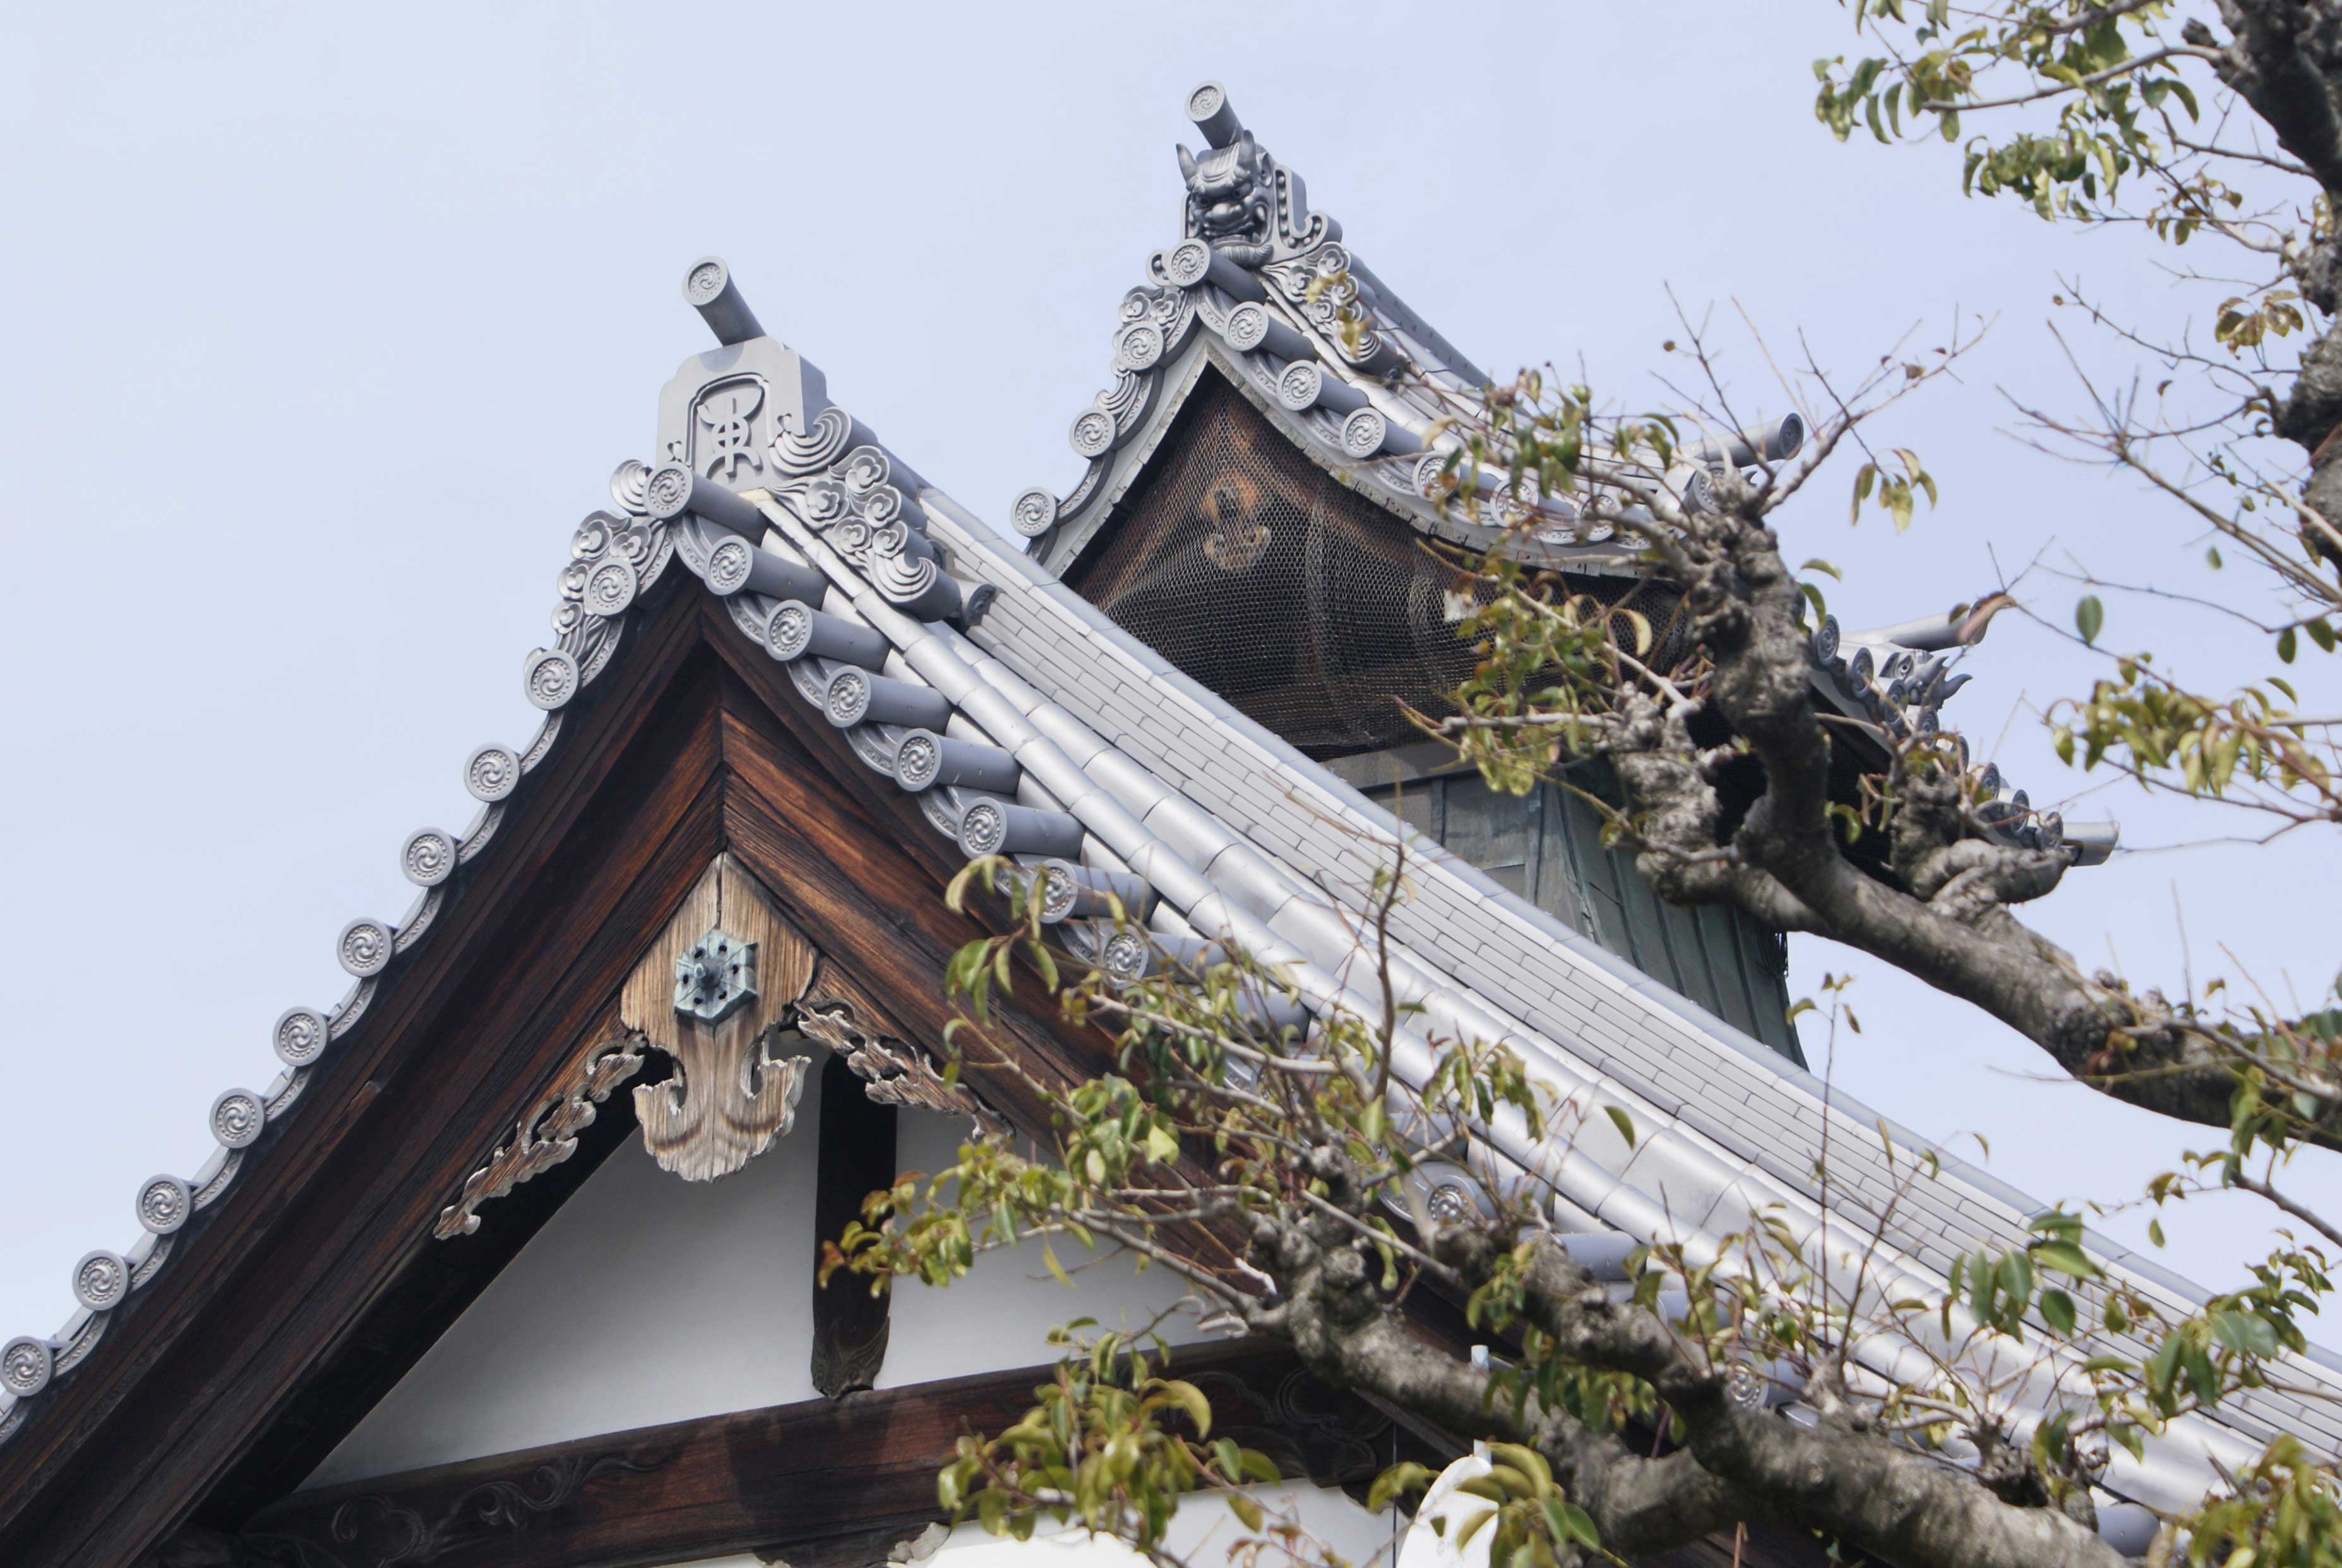 <p>大棟南寄りに切妻造の煙出</p>庫裏は寺務所や台所などの機能をもつ施設で、屋根には煙出がある。